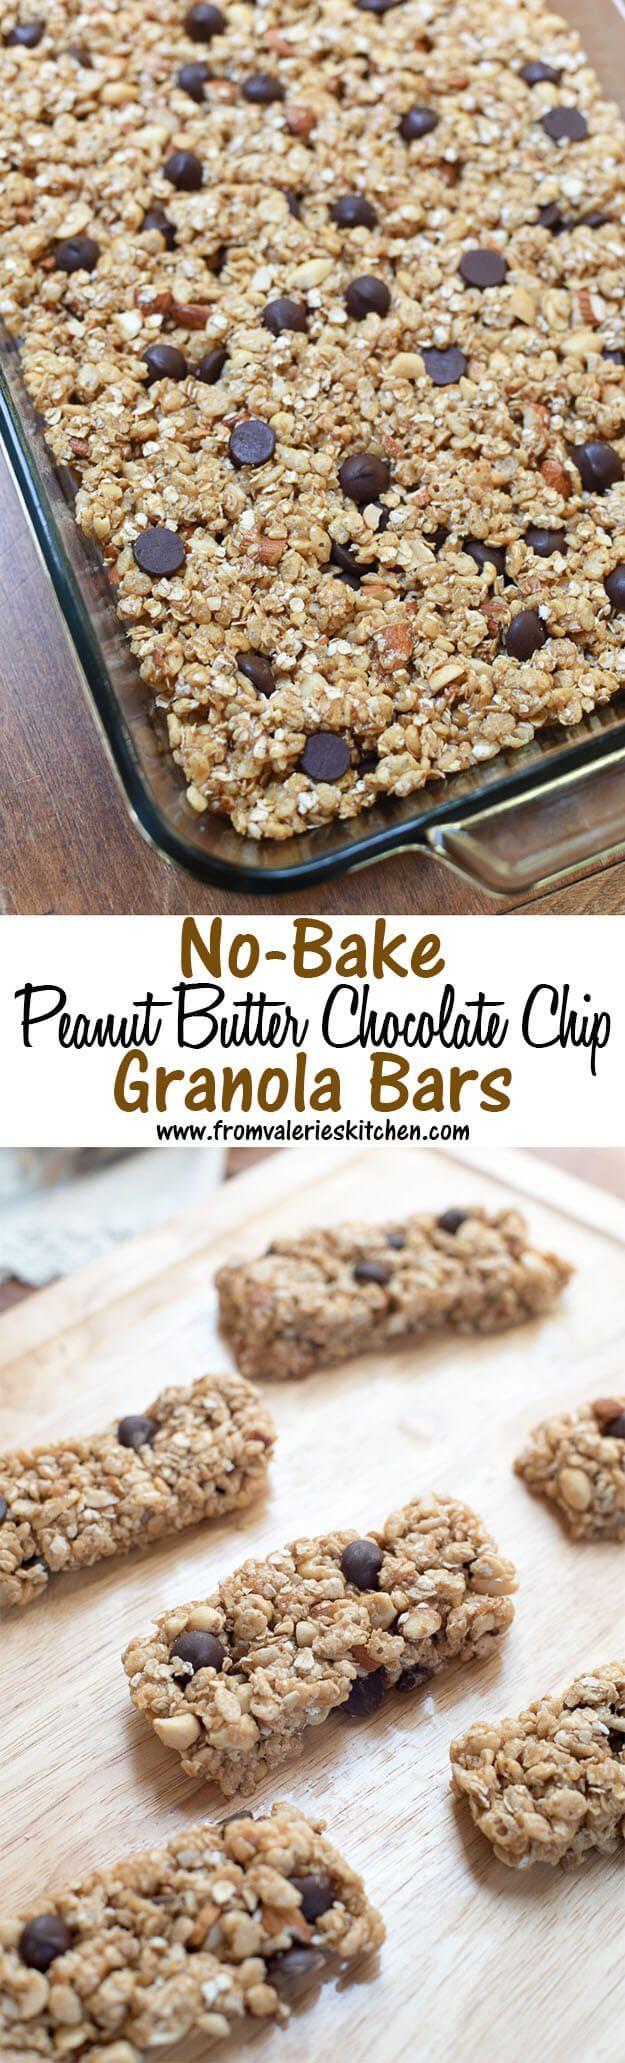 EASY, no-bake, kid-friendly homemade granola bars. ~ http://www.fromvalerieskitchen.com